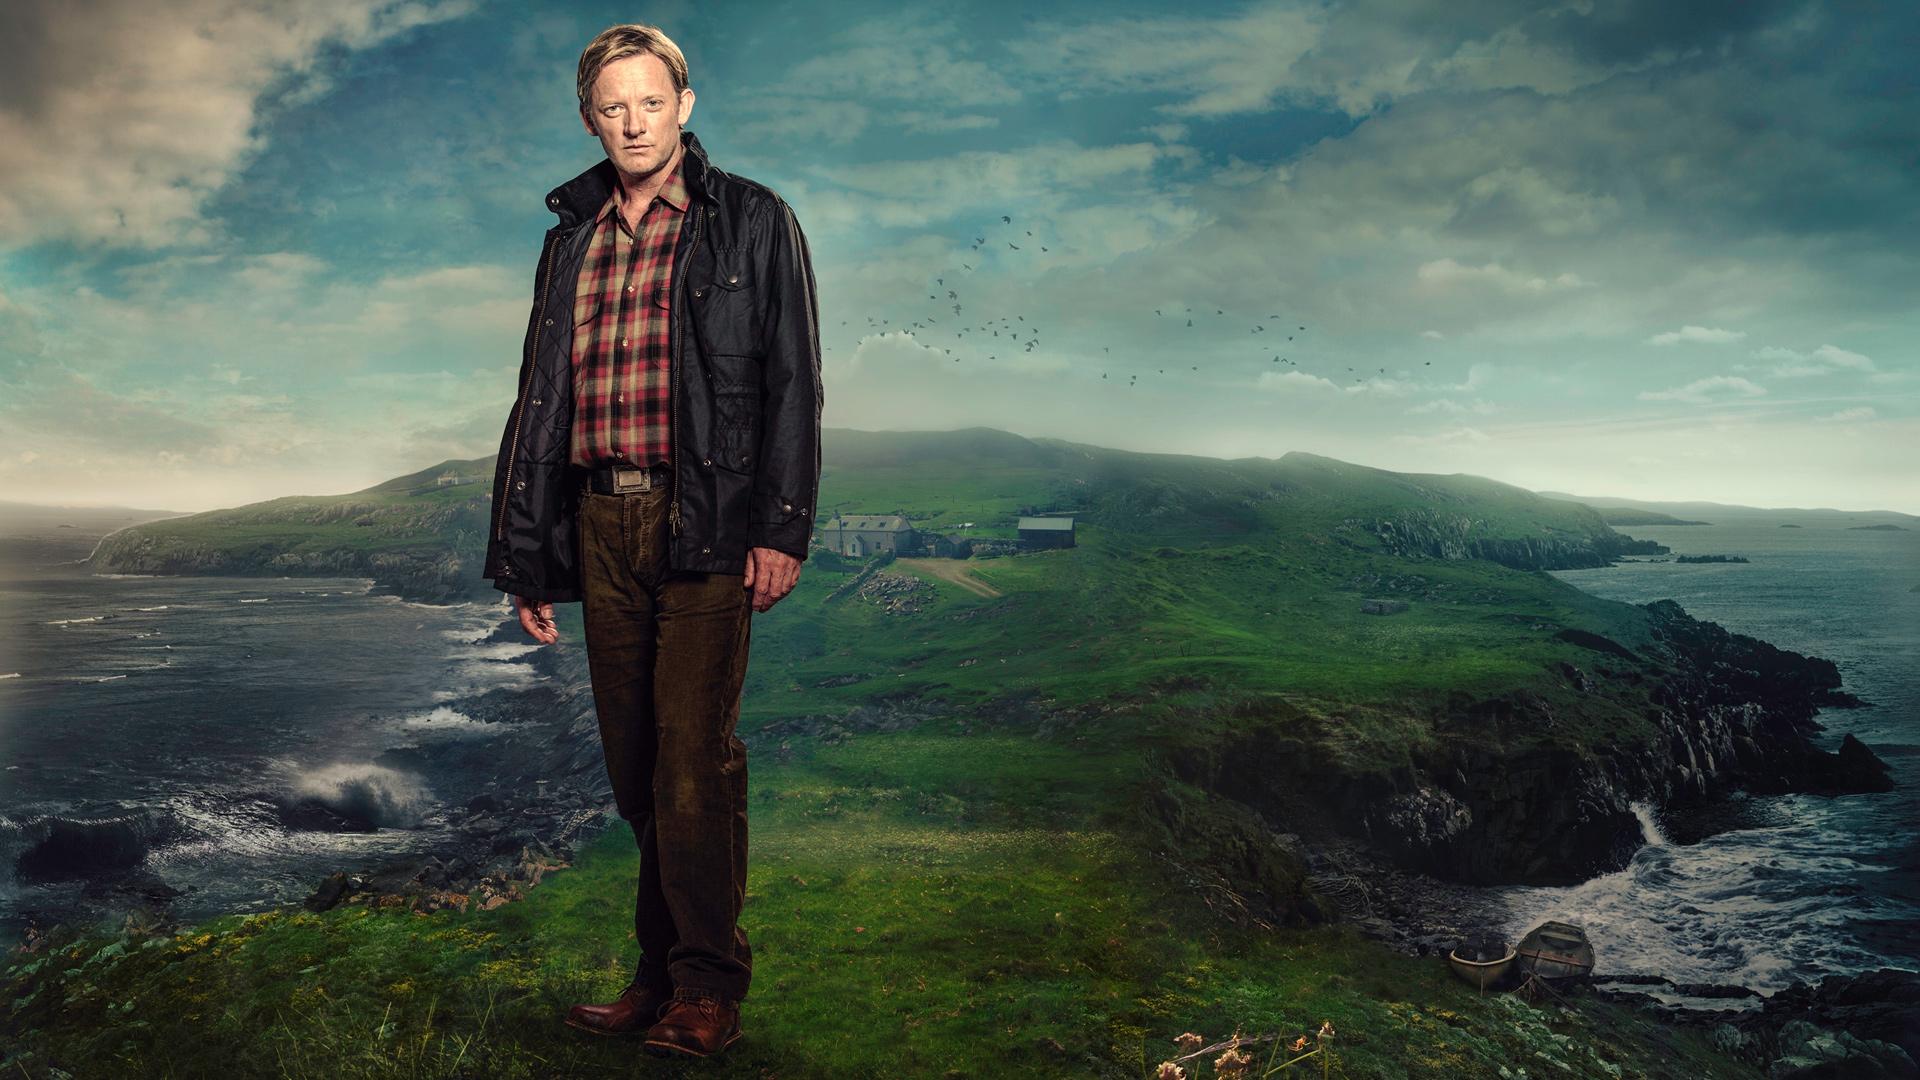 Vierde seizoen Shetland binnenkort te zien op NPO2